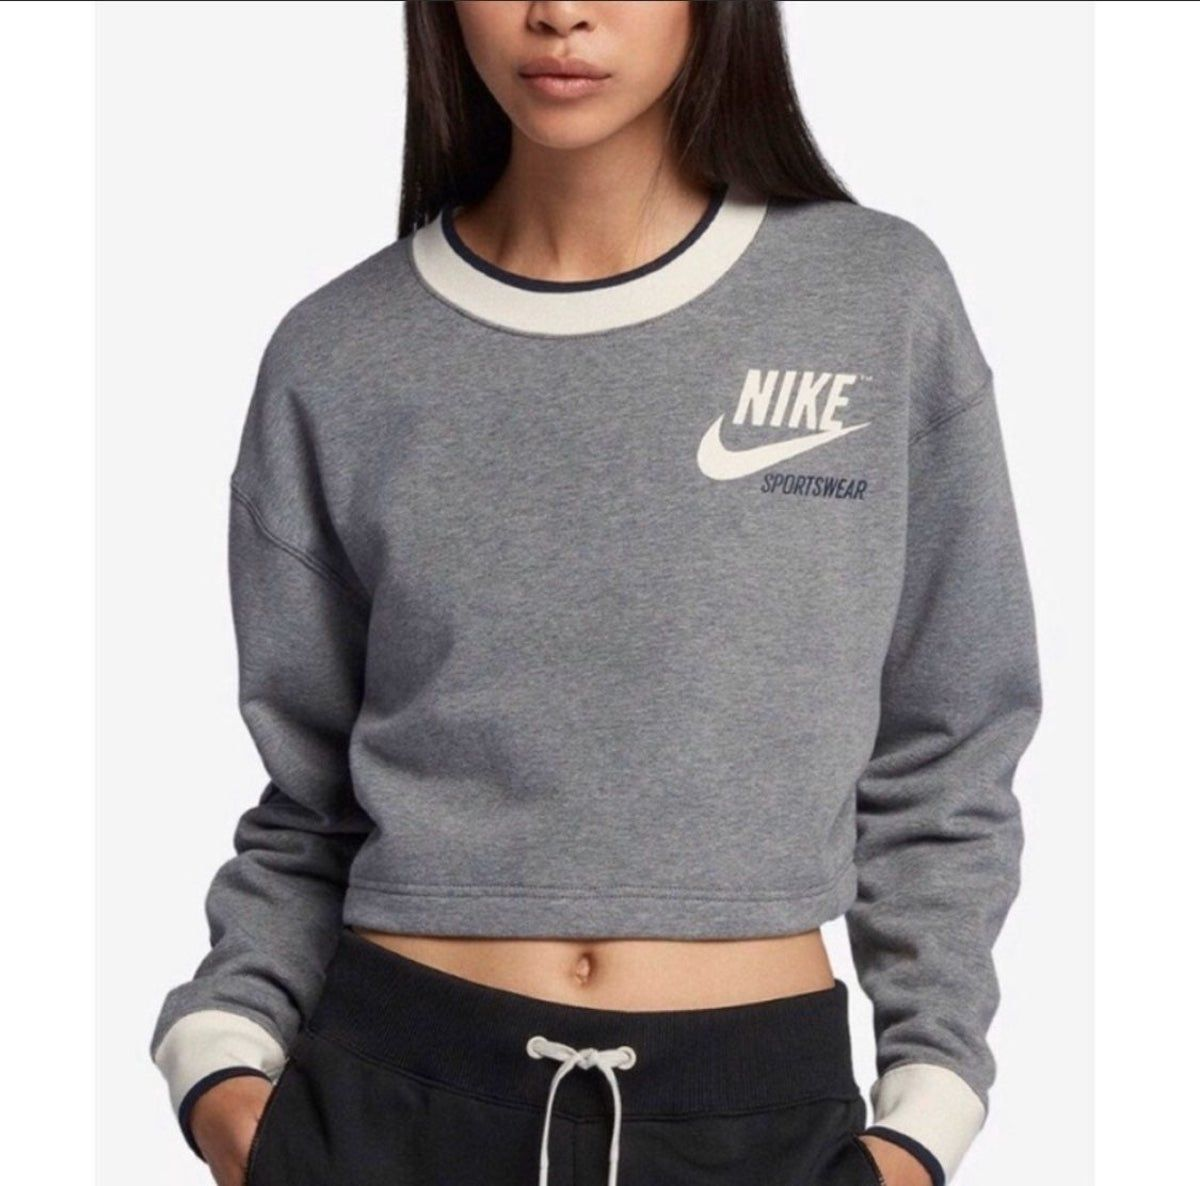 Nike Reversible Fleece Cropped Sweatshir Sweatshirts Nike Outfits Crop Sweatshirt [ 1186 x 1200 Pixel ]